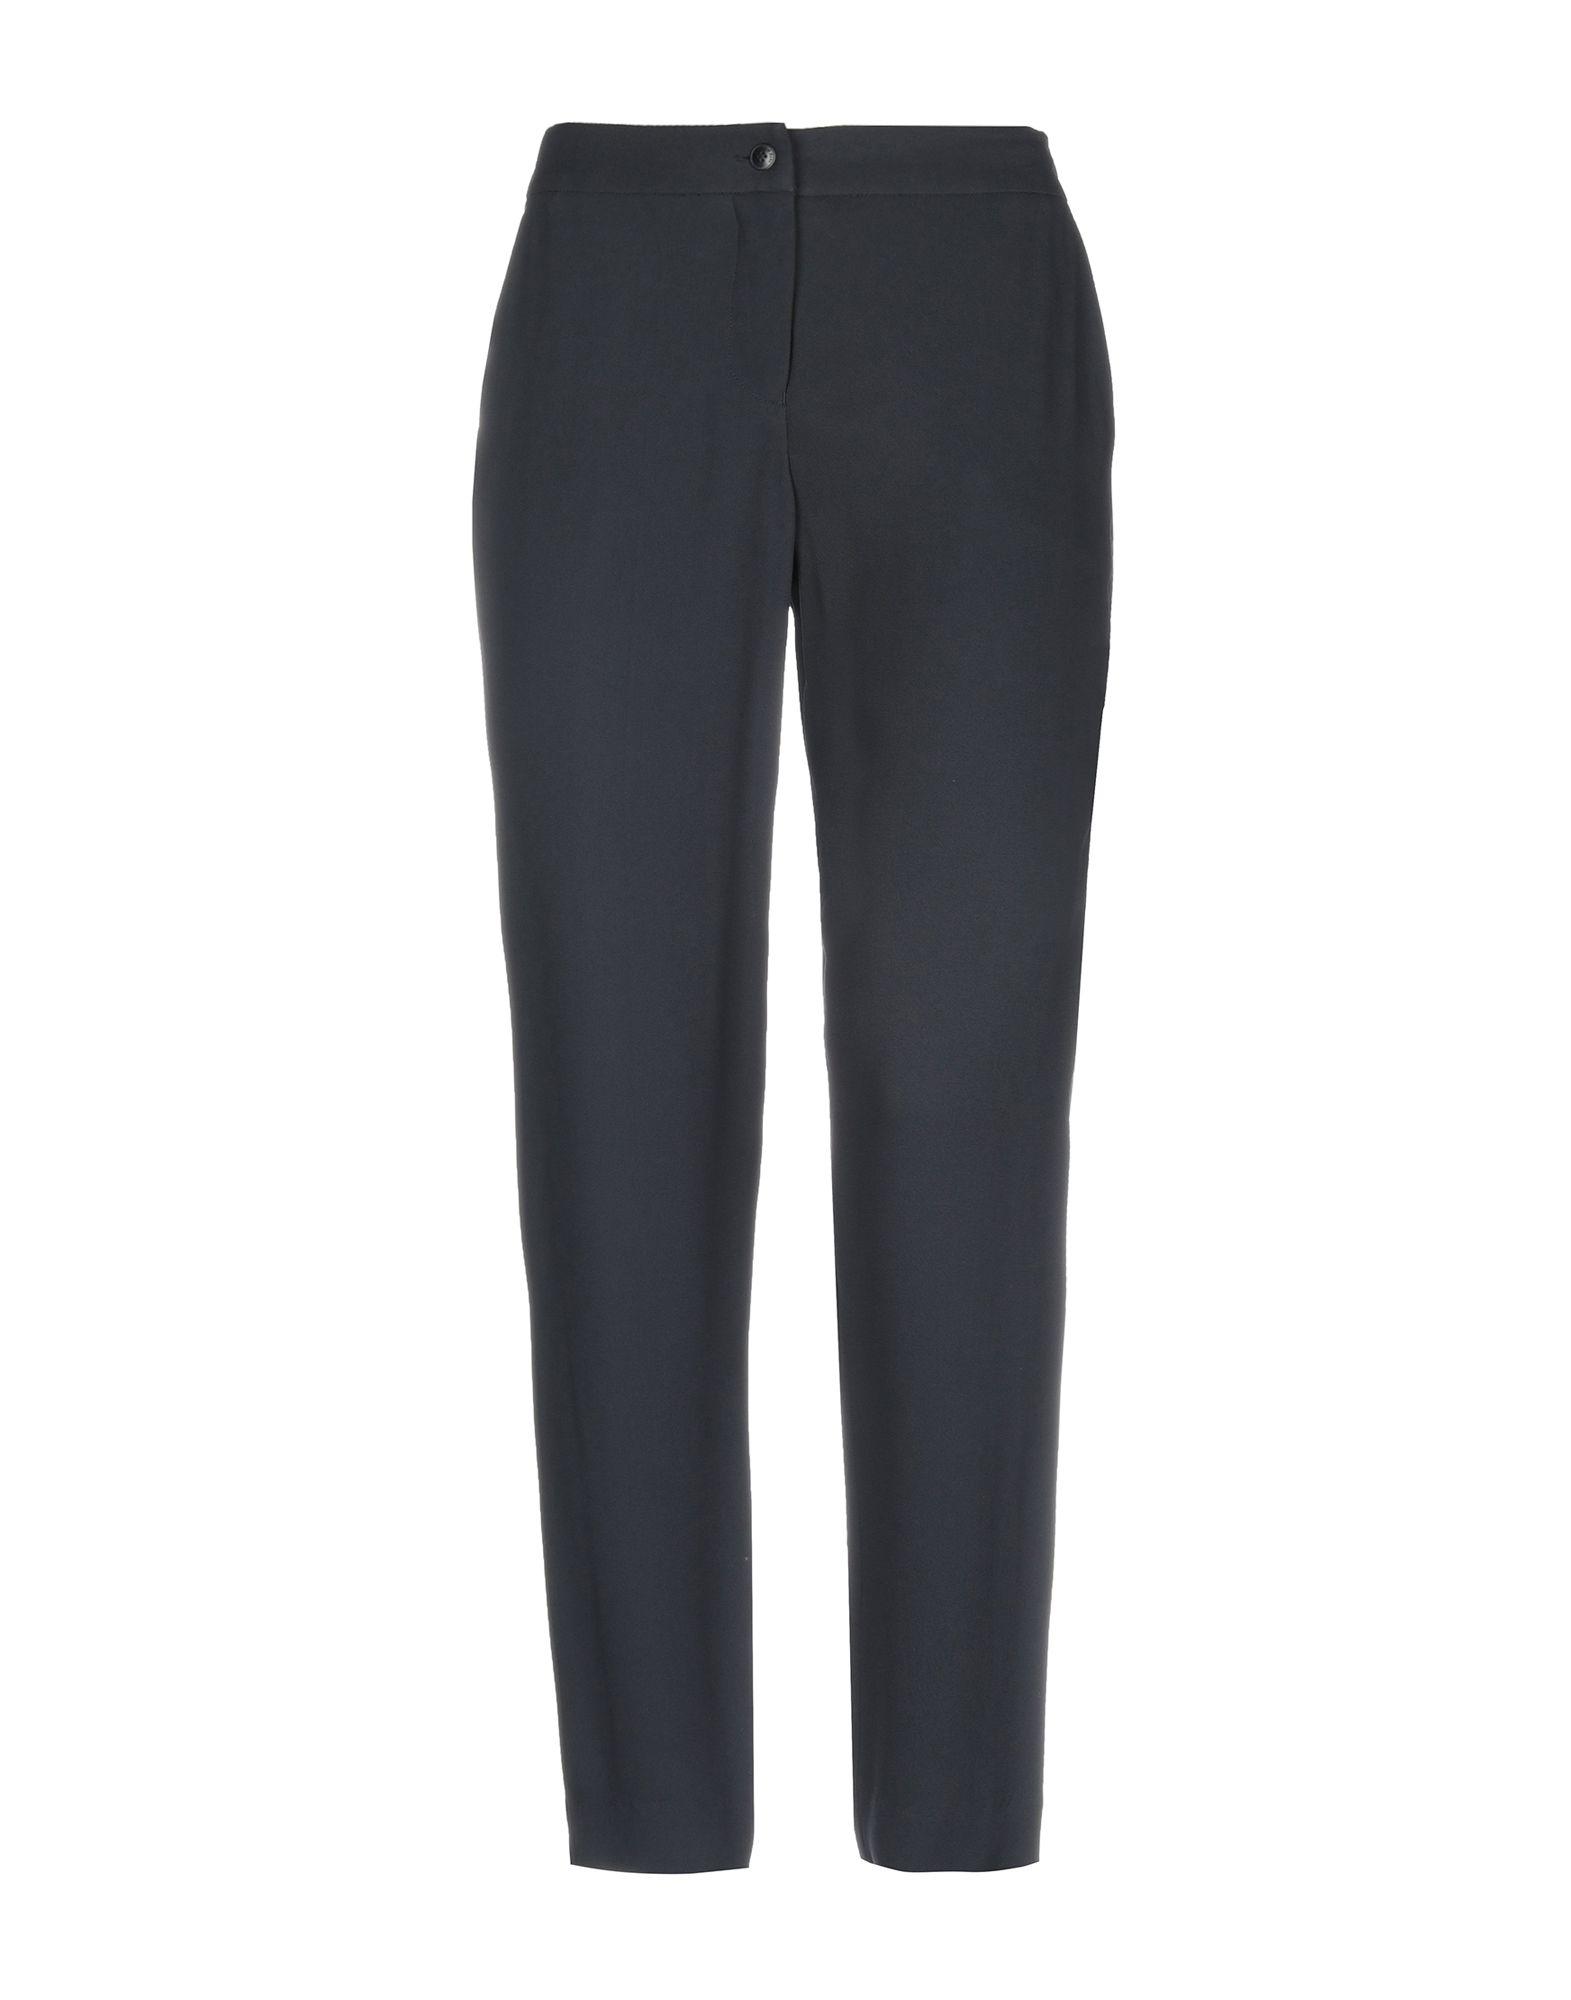 Pantalone Pantalone Armani Jeans donna - 13135235PL  bequem